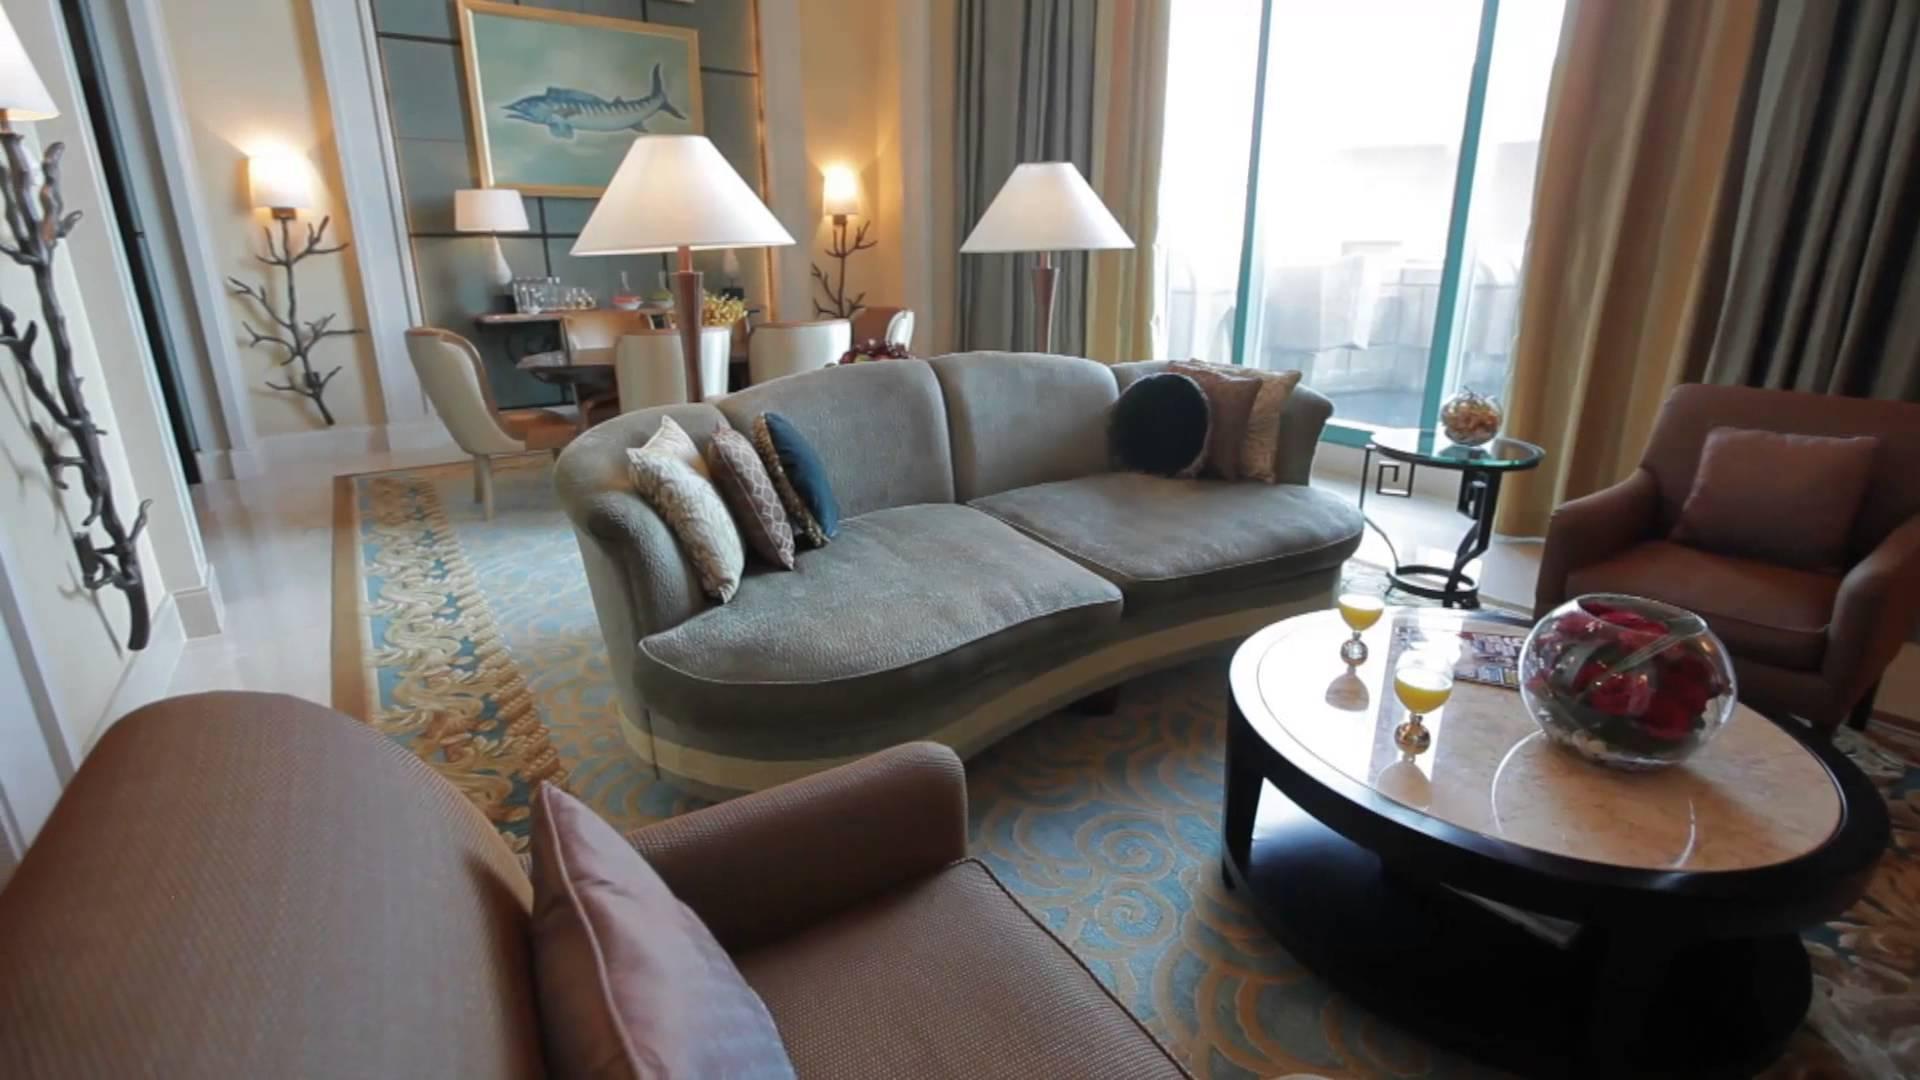 Underwater Hotel Room In Dubai: Dive Into Luxury